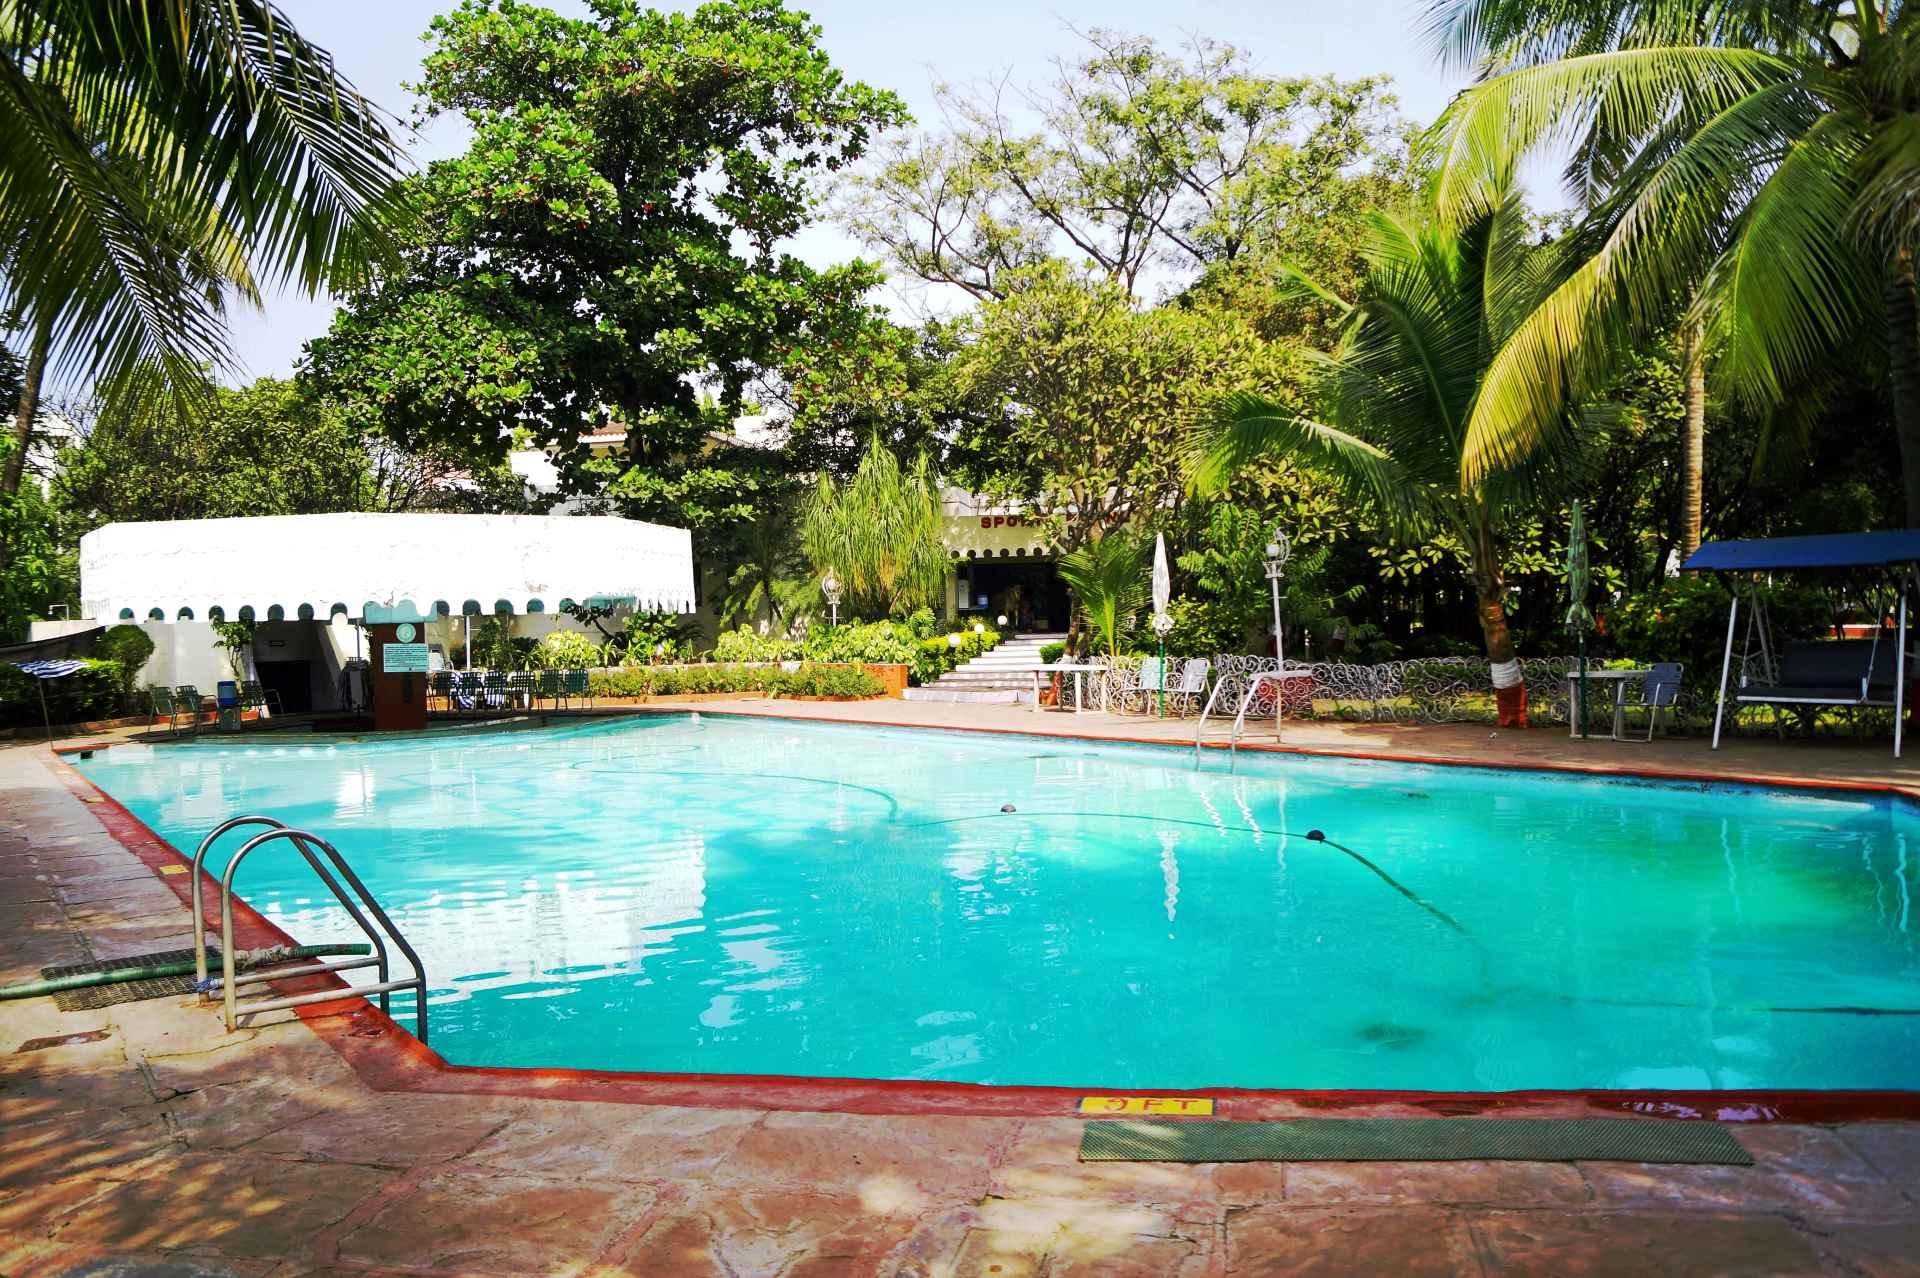 Swimming Pool ambassador ajanta aurangabad 2 - The Ambassador | Heritage Hotels in Mumbai, Aurangabad, Chennai - Blogs